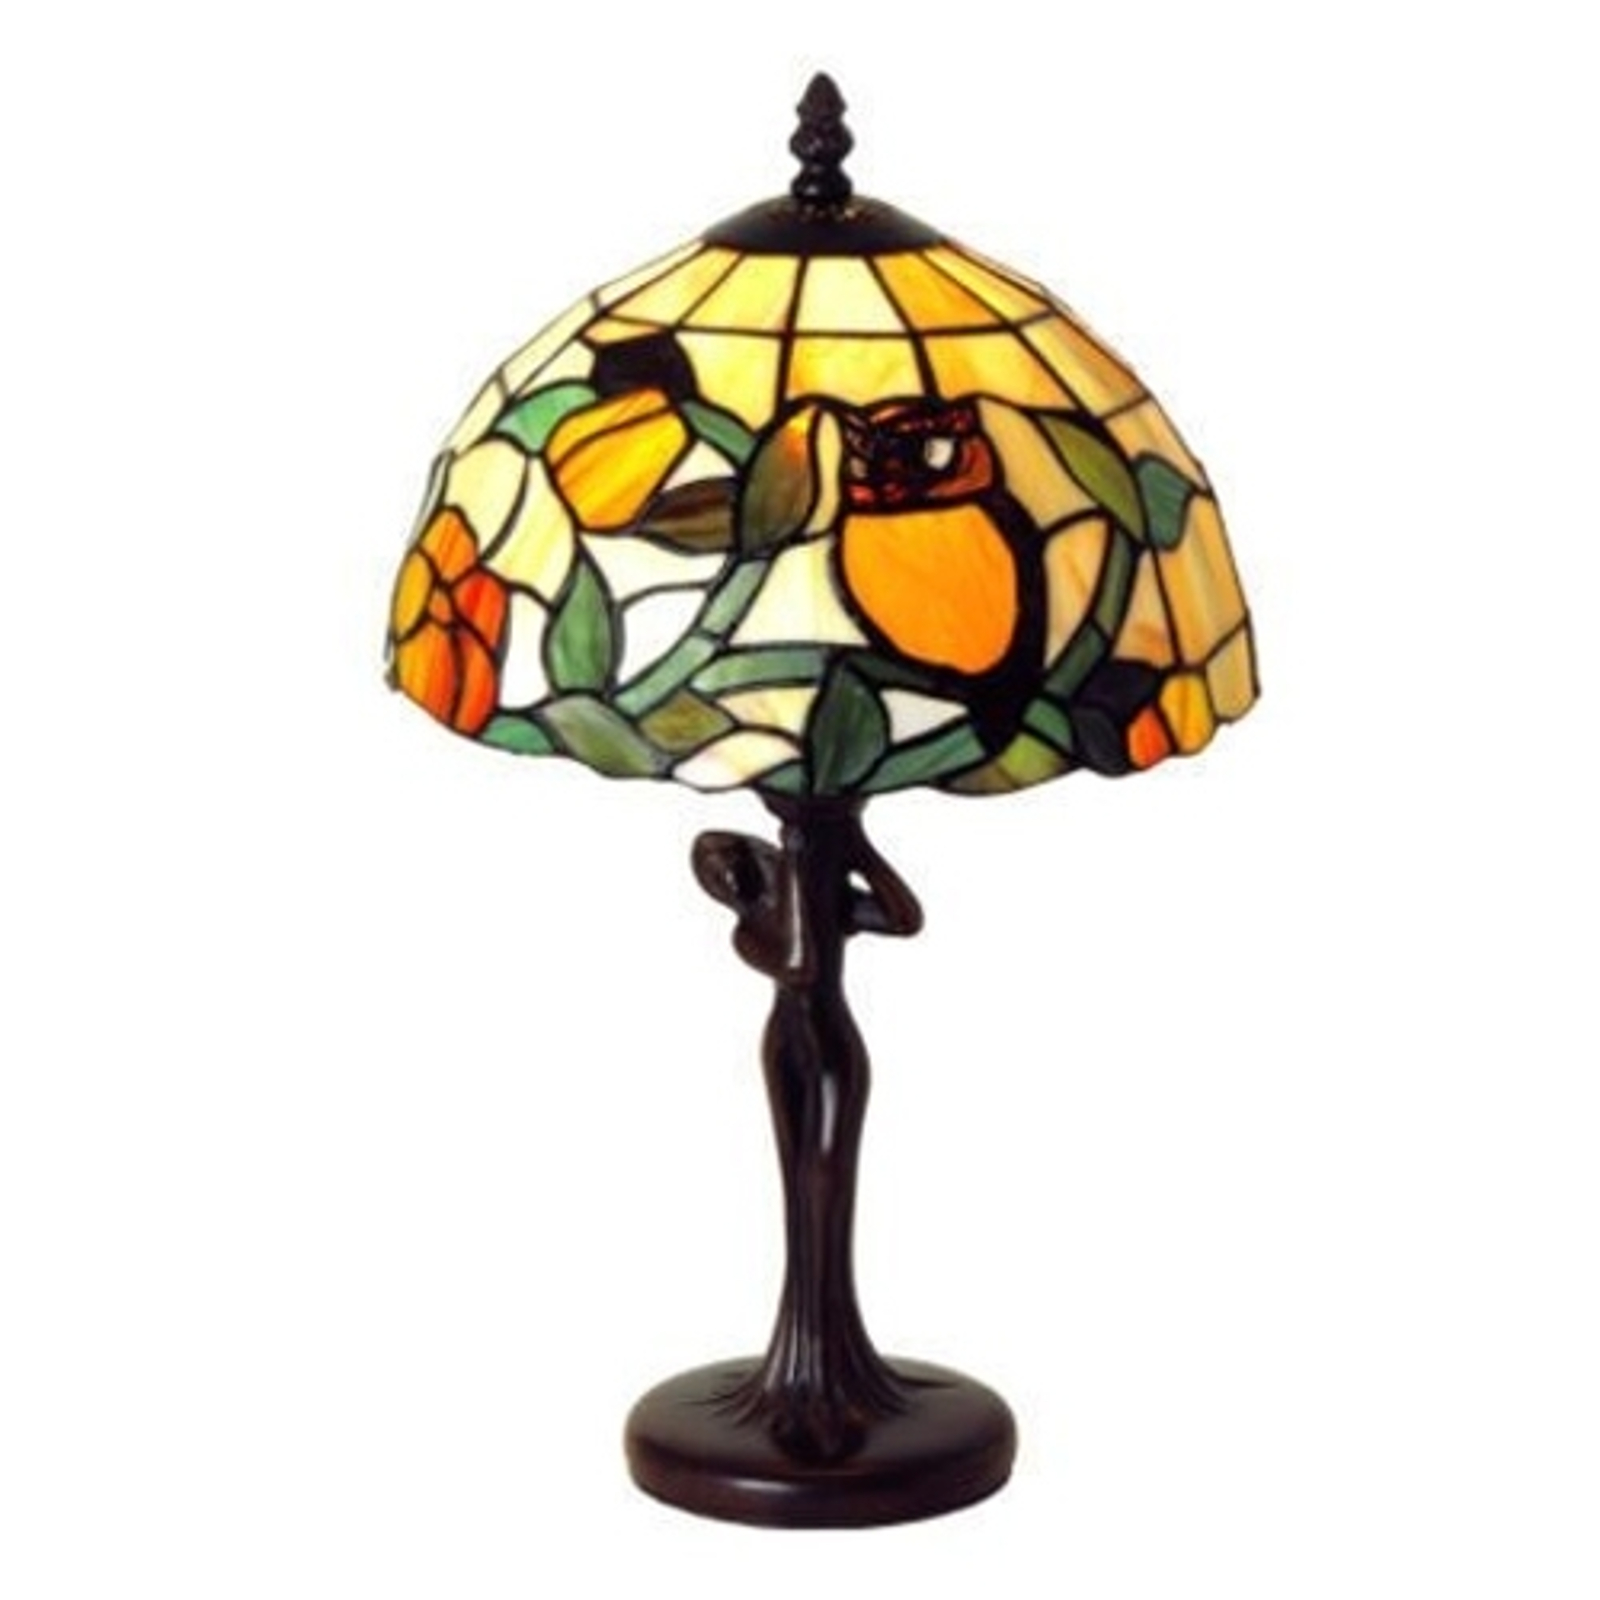 LIEKE – stolná lampa v štýle Tiffany_1032199_1